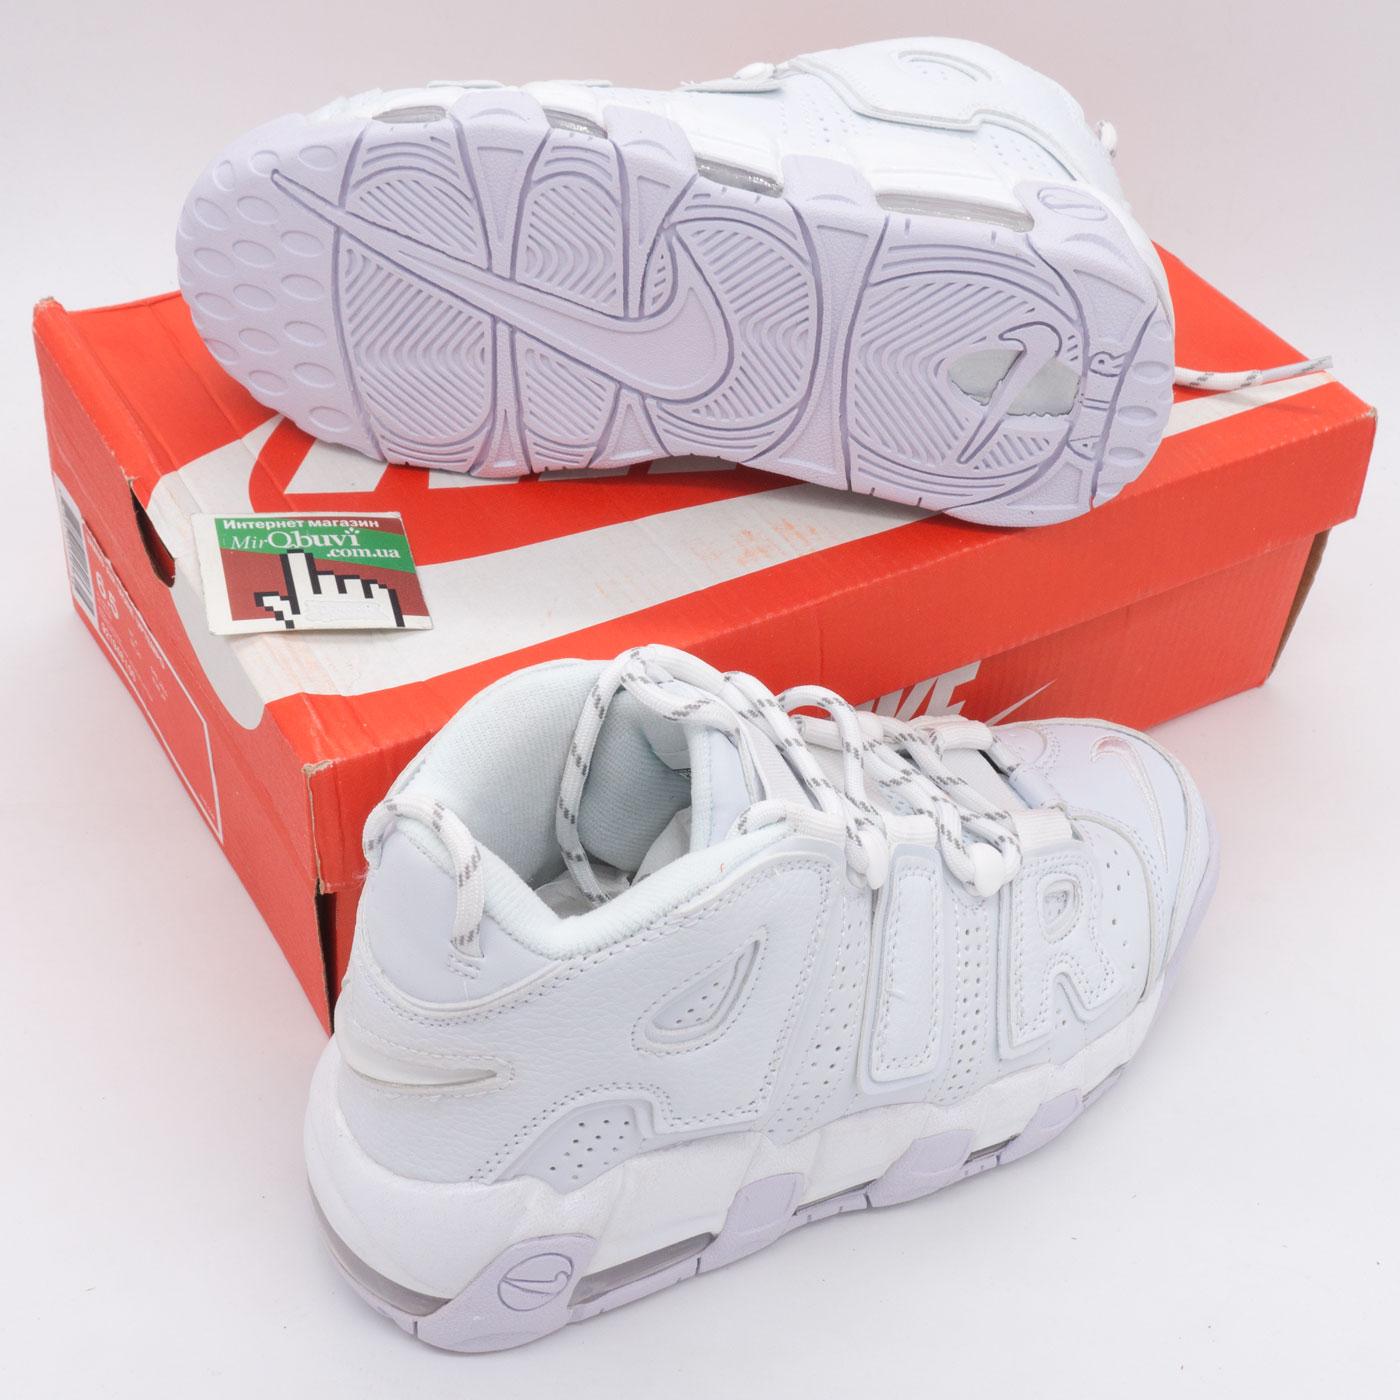 фото bottom Кроссовки Nike Air More Uptempo белые. Топ качество! bottom